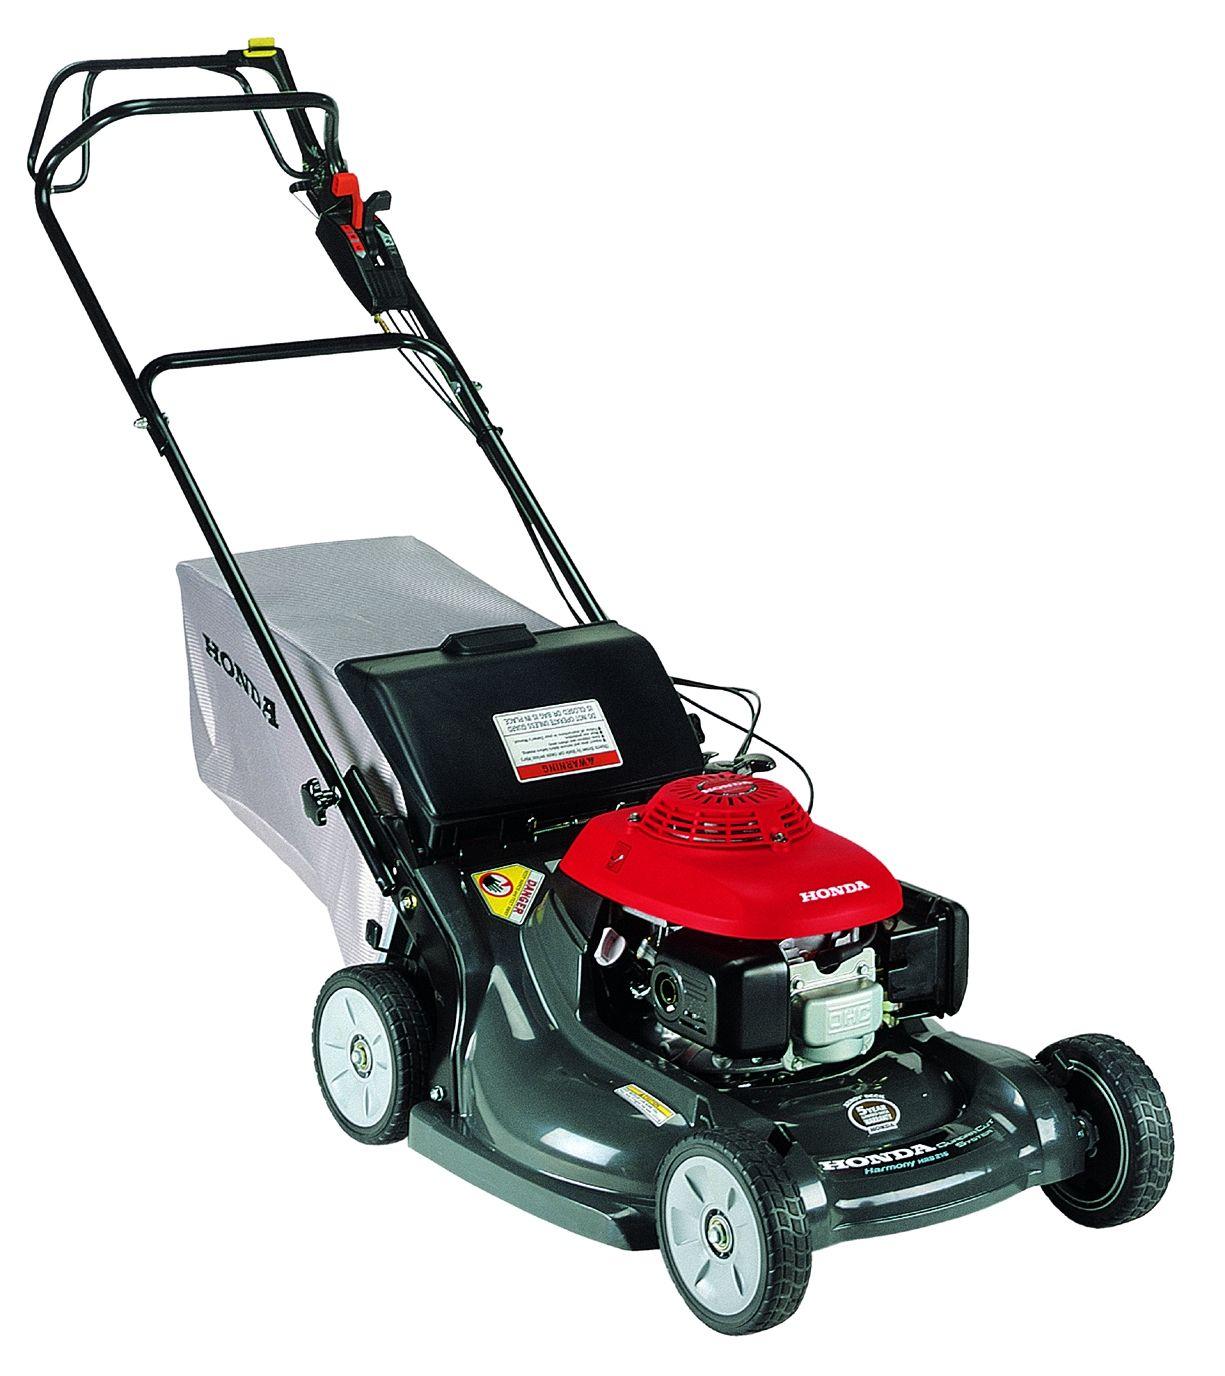 My Lawn Mowers Shop Lawn Mower Lawn Mower Parts Mower Shop